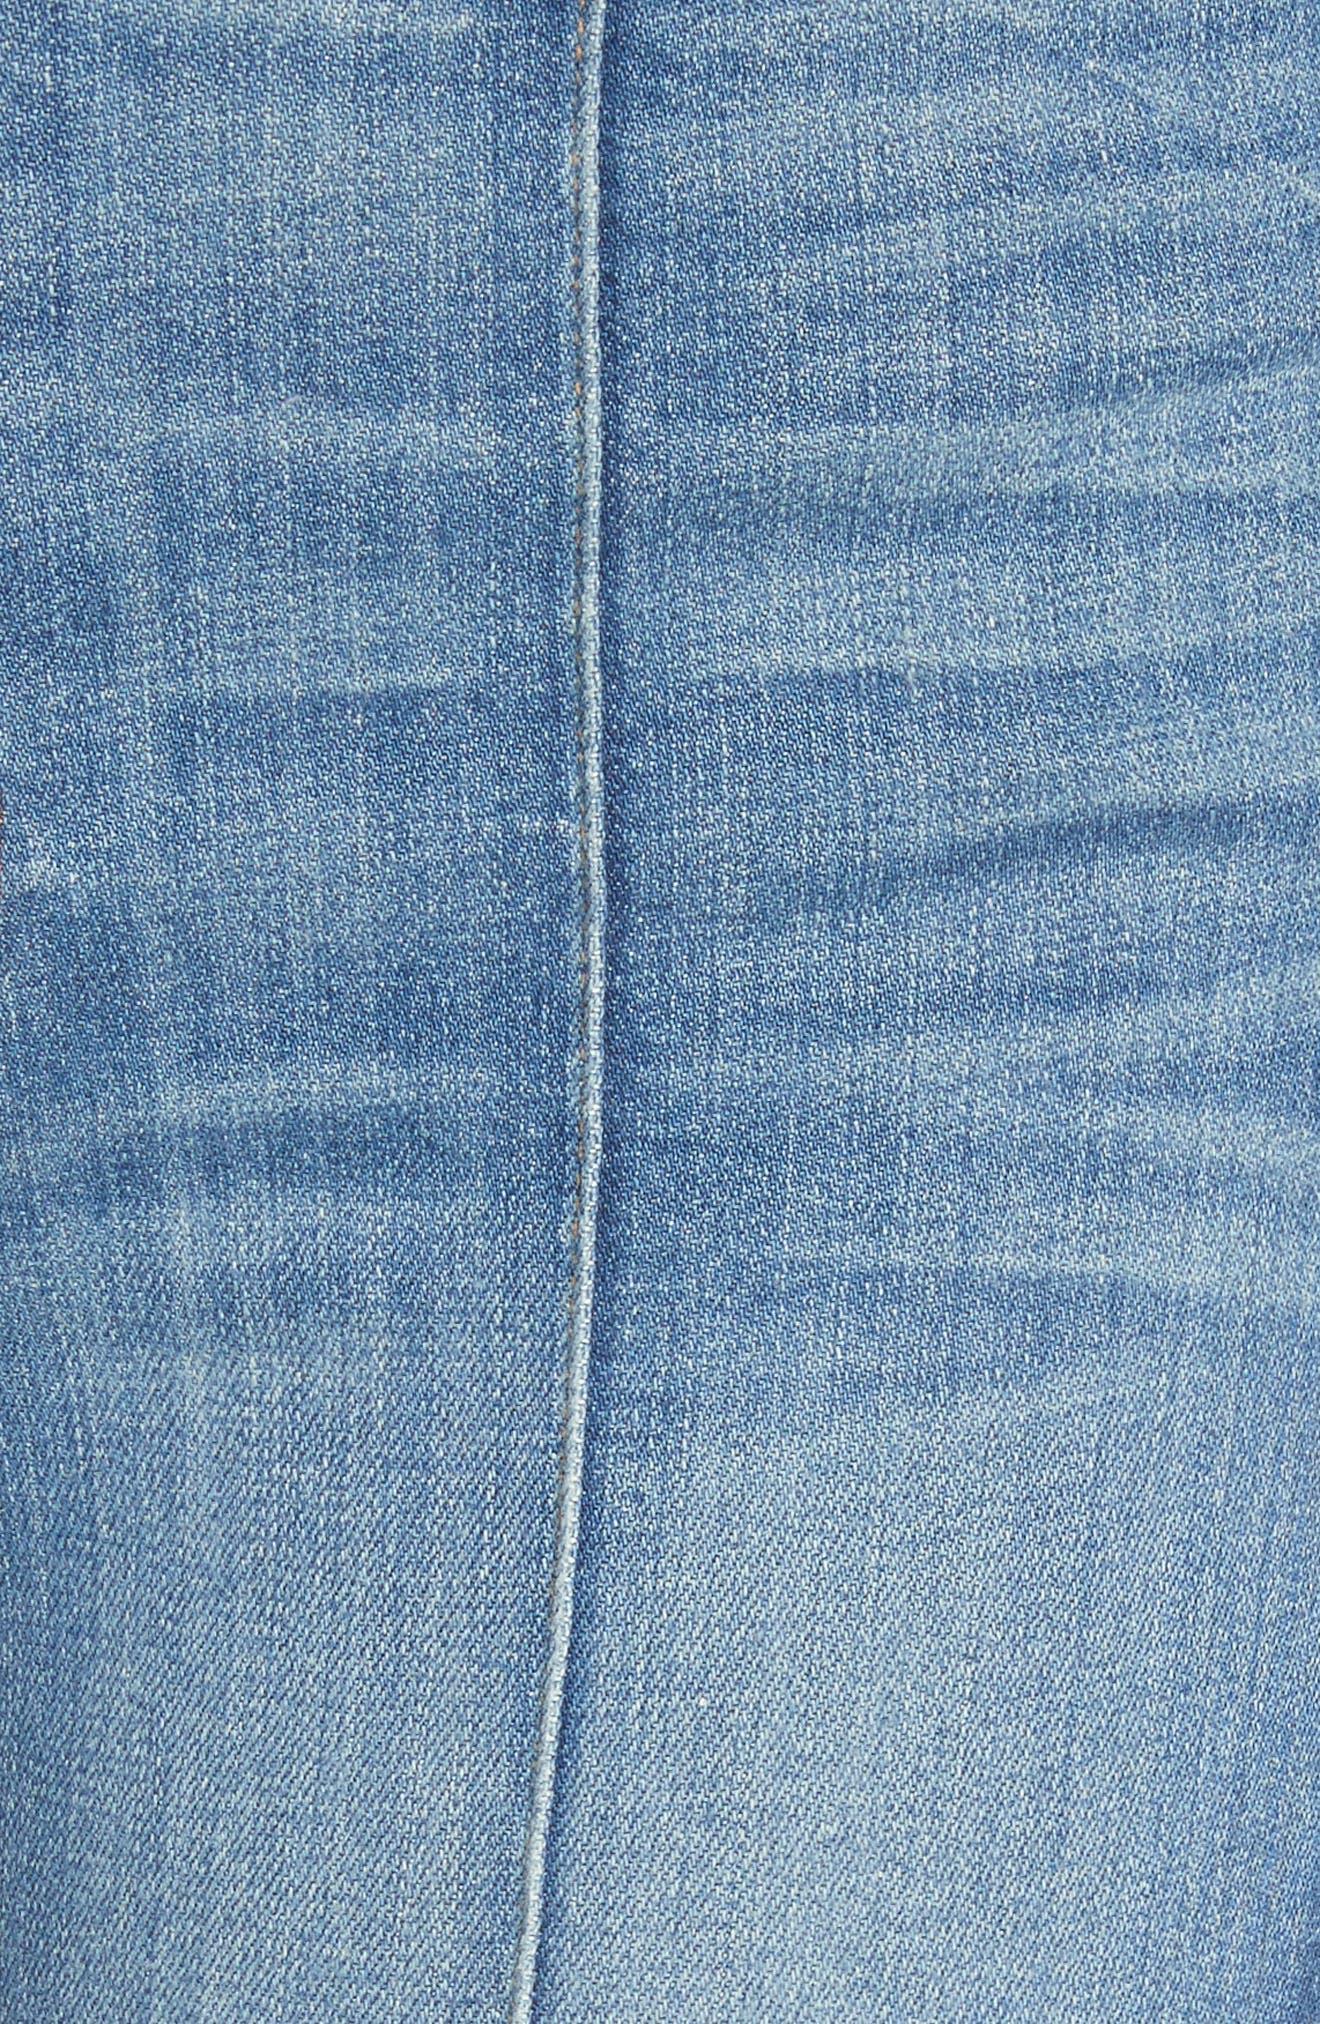 AO.LA Good High Waist Pintuck Skinny Jeans,                             Alternate thumbnail 5, color,                             Roadhouse Blues